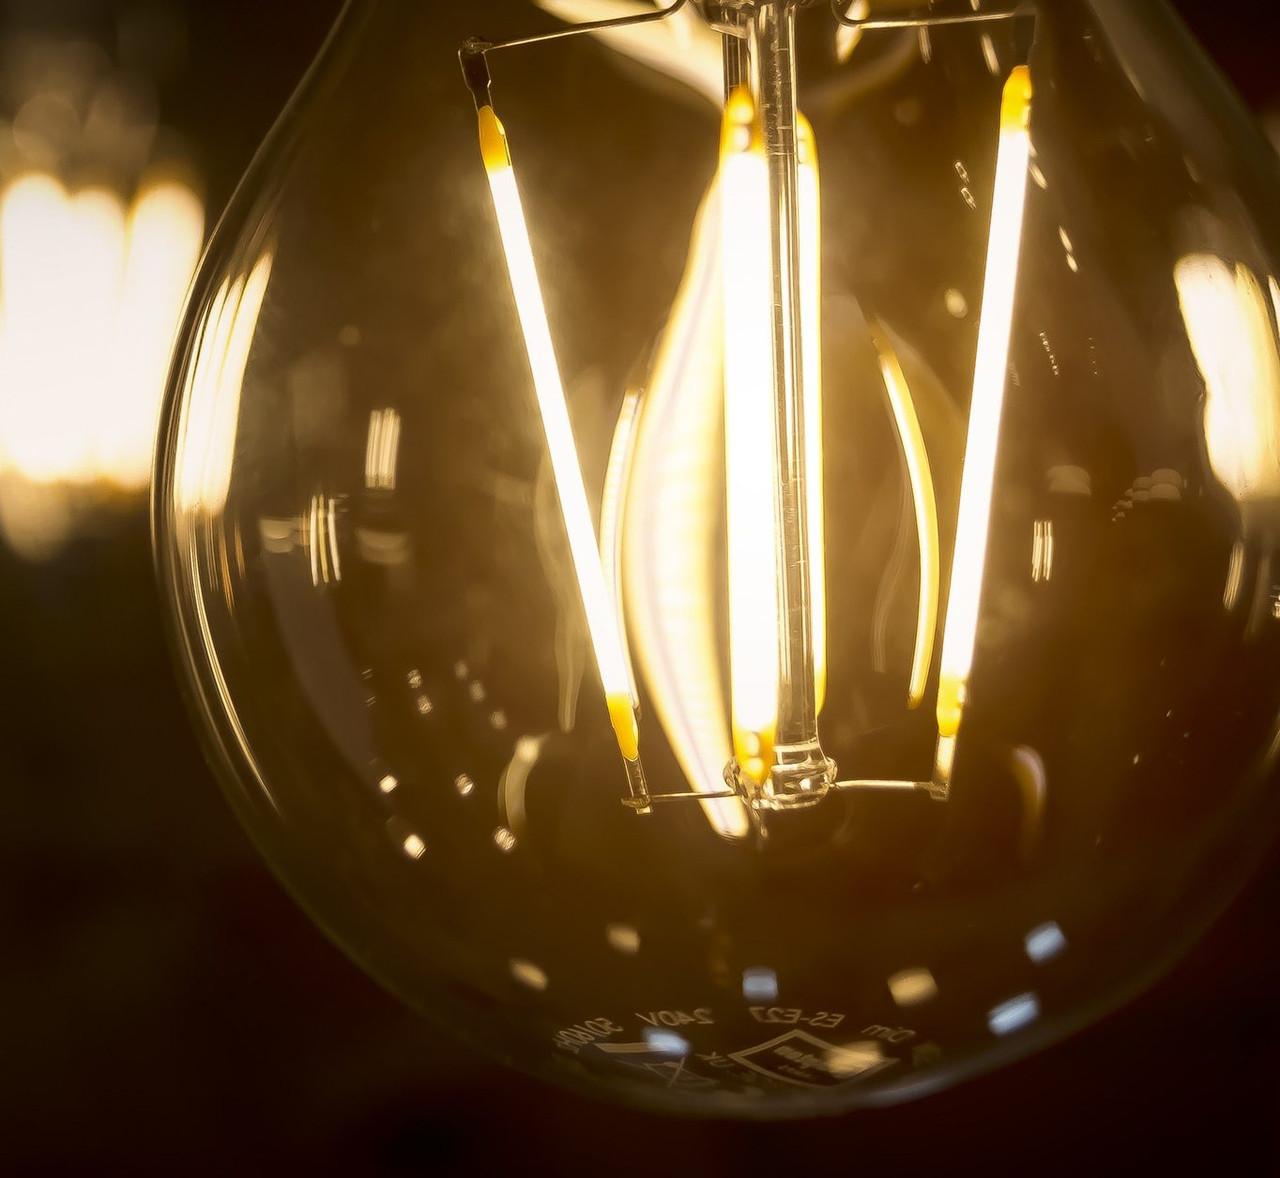 LED Dimmable A65 12 Watt Light Bulbs